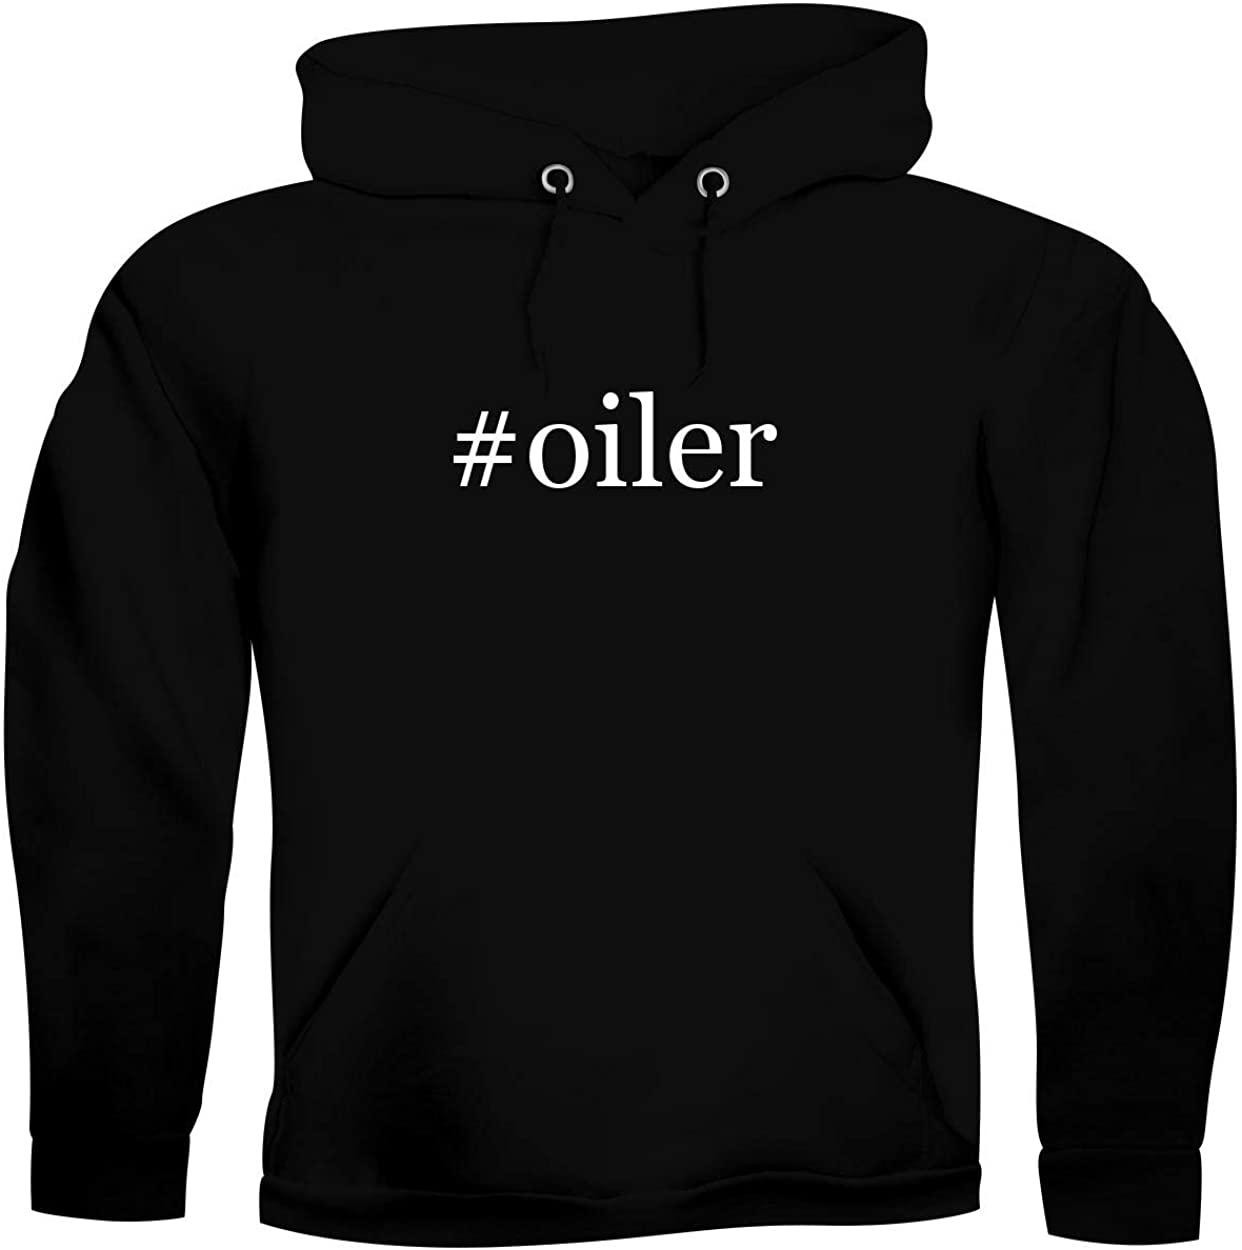 #oiler - Men's Hashtag Ultra Soft Hoodie Sweatshirt